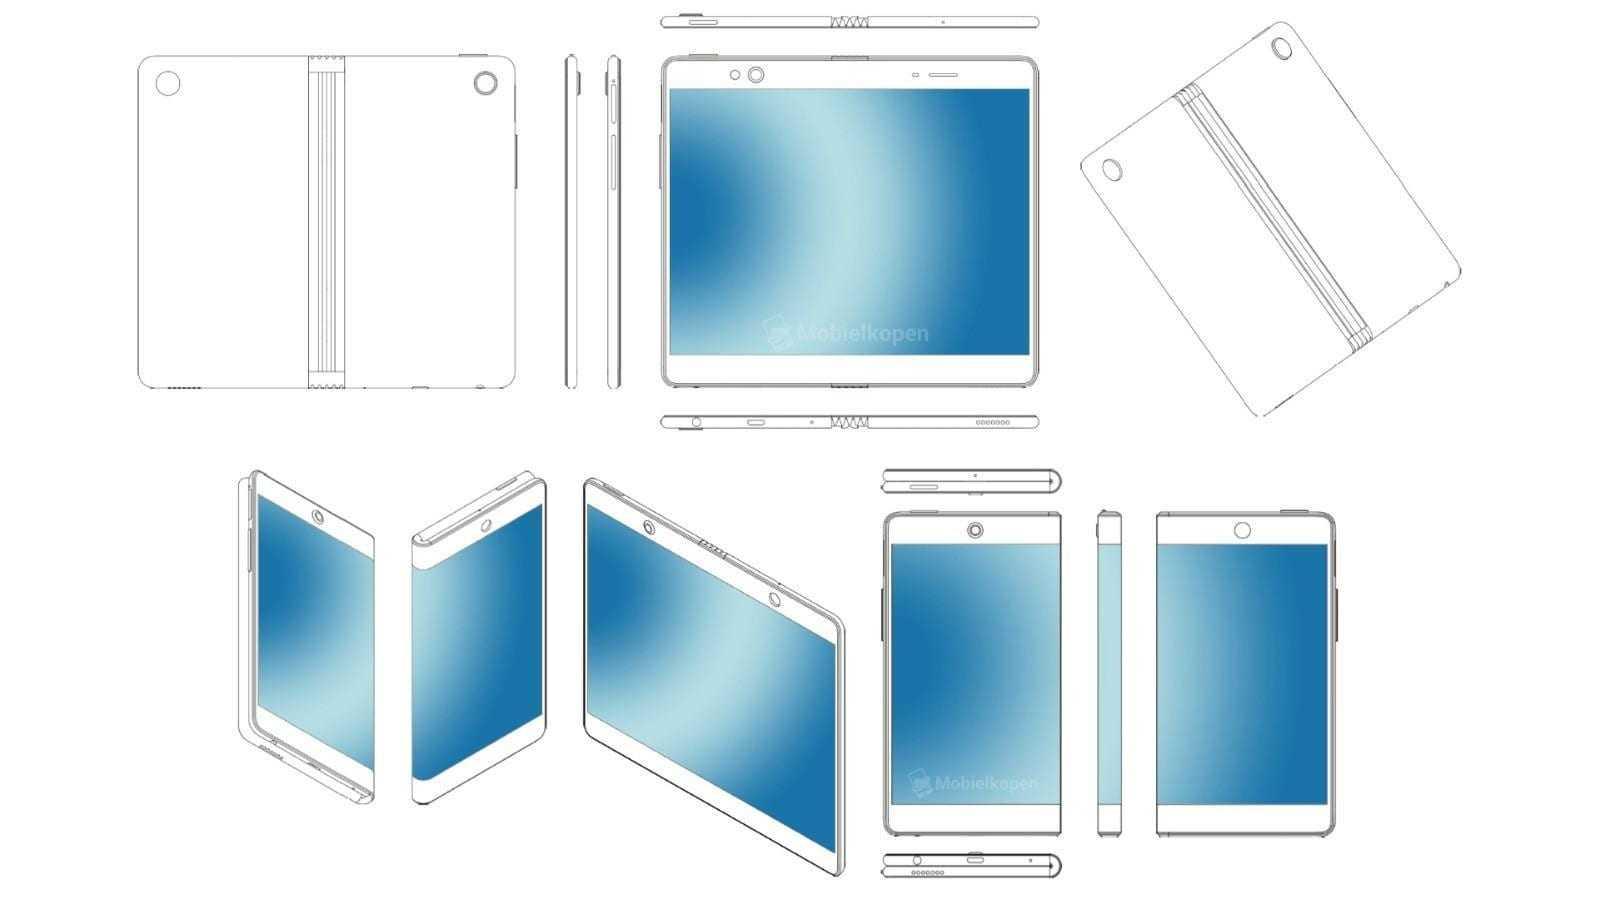 Oppo представит гибкий смартфон в феврале следующего года